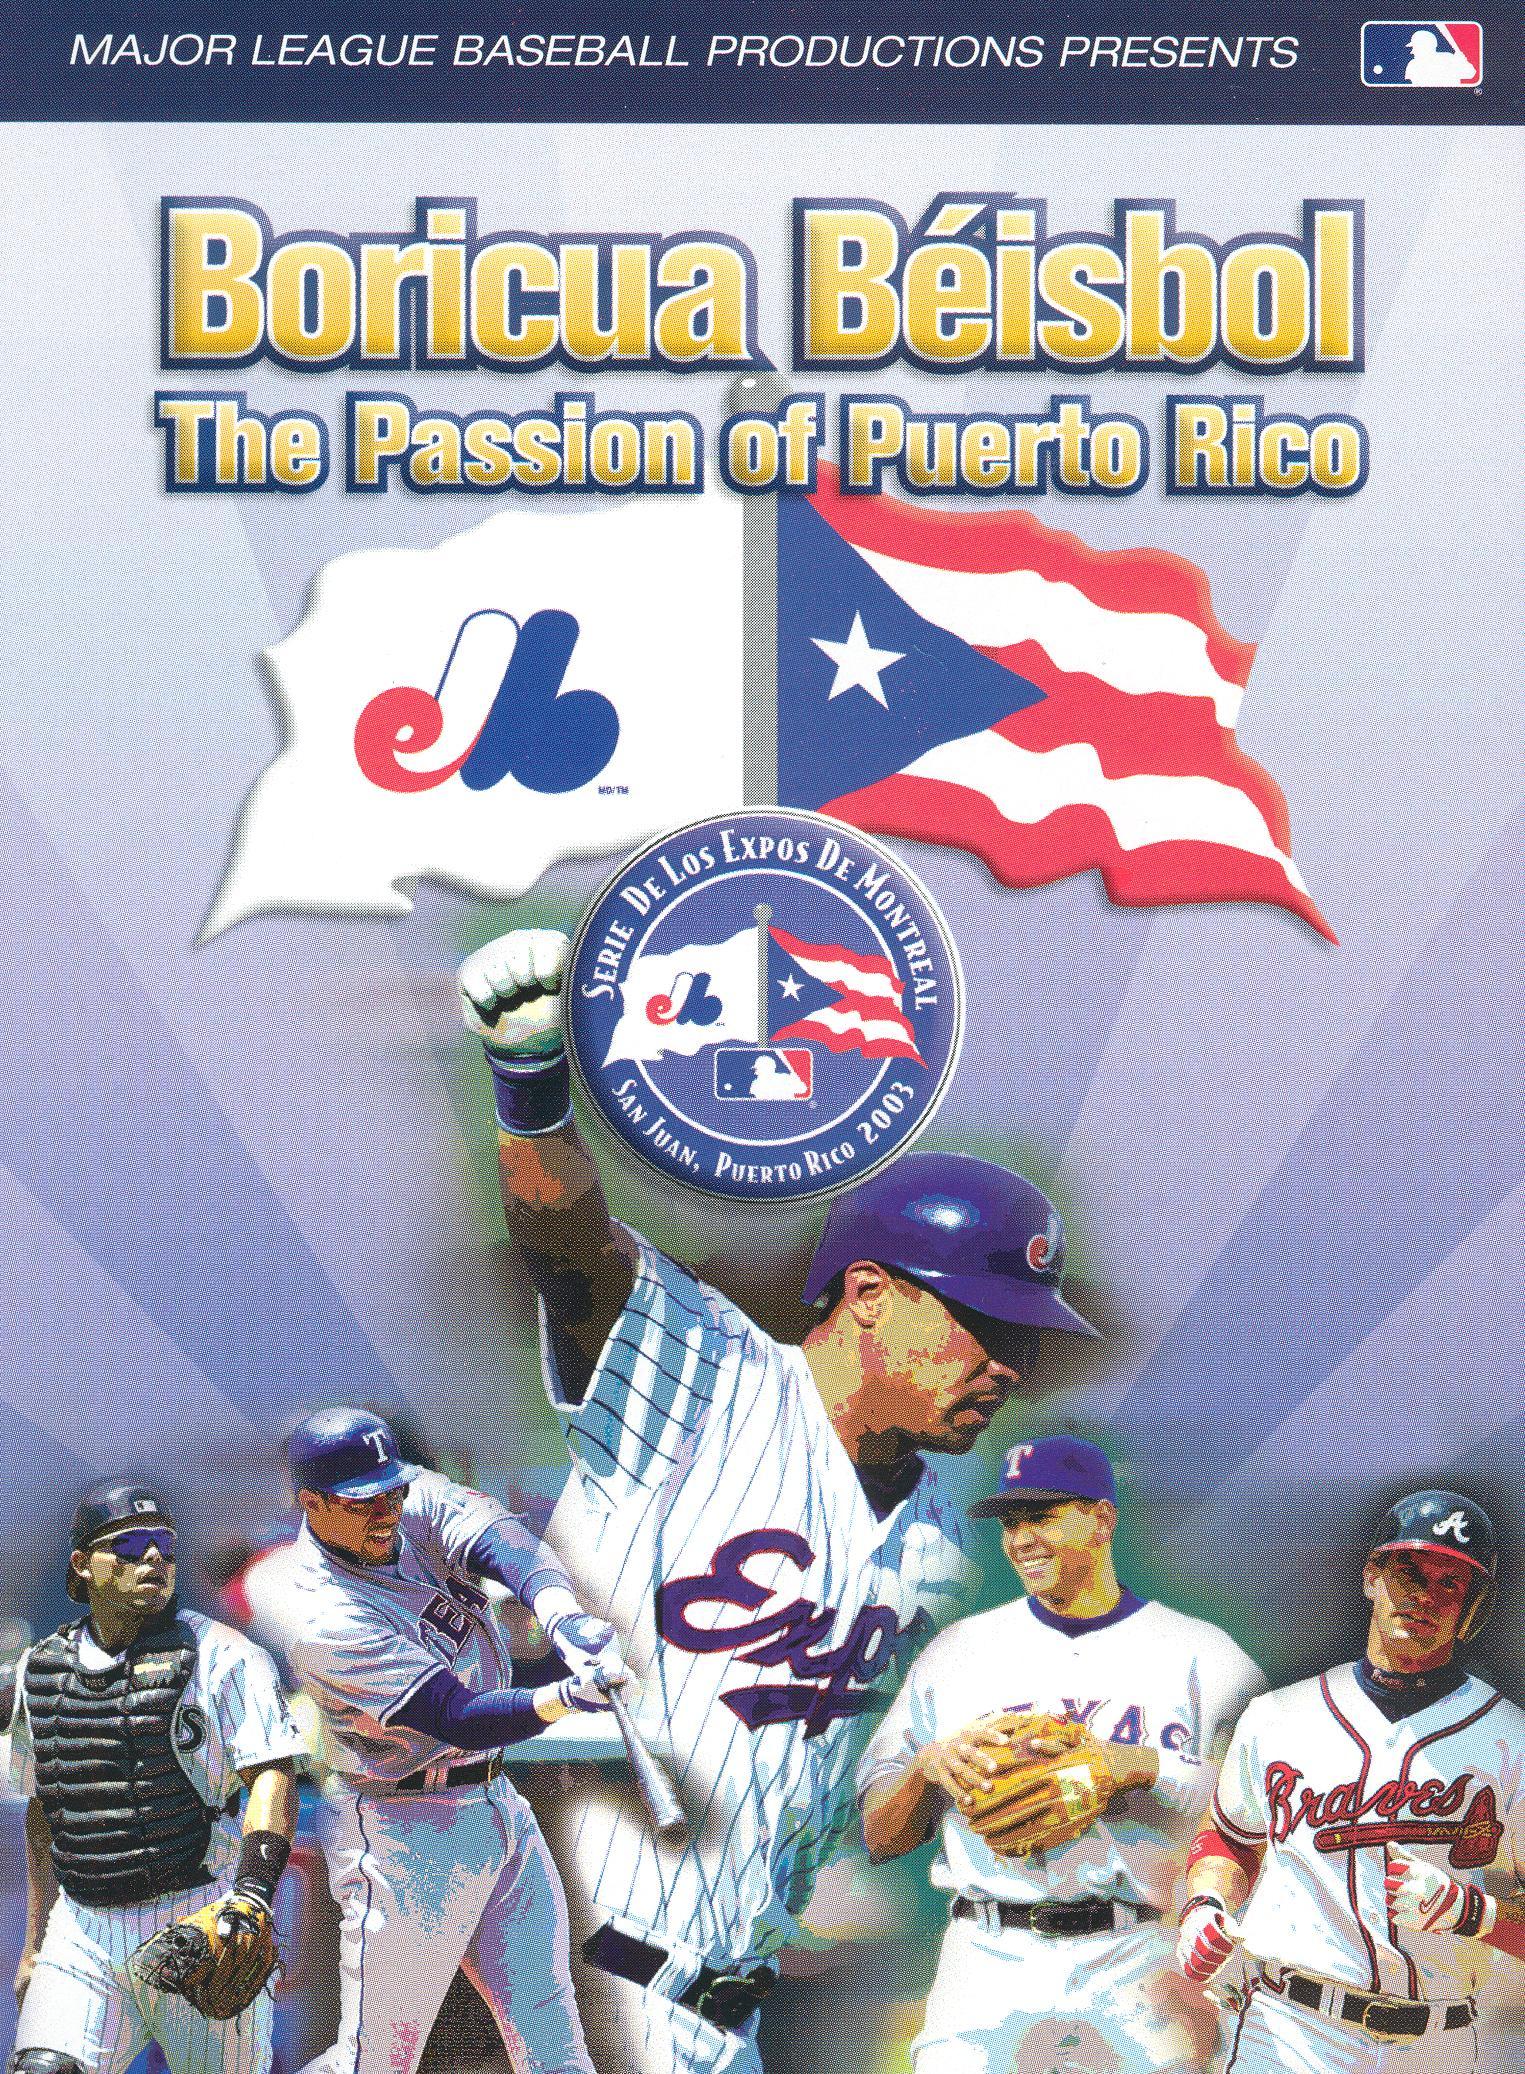 MLB: Boricua Béisbol - The Passion of Puerto Rico